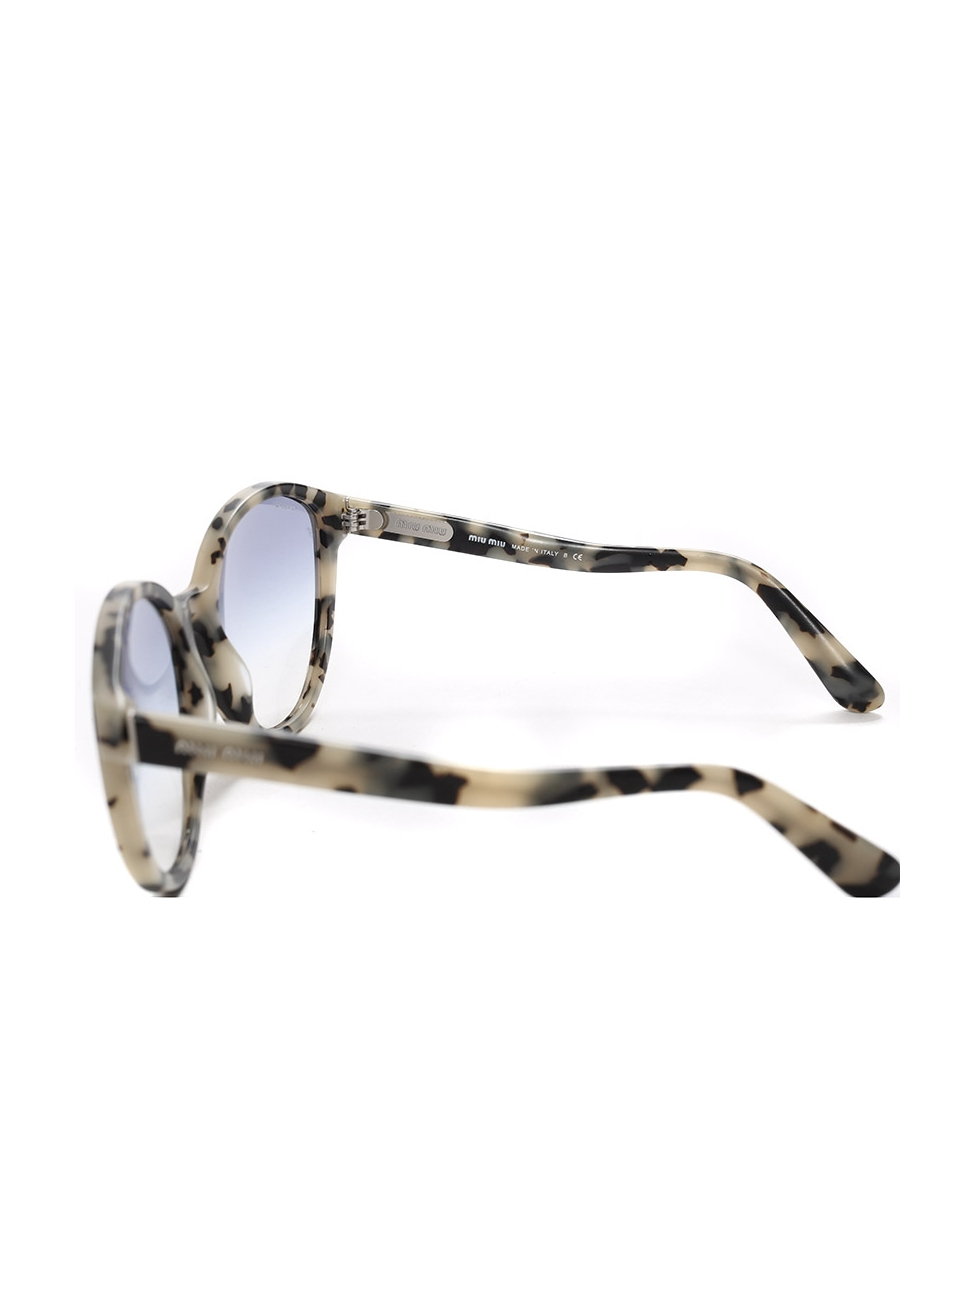 2be450a56998 Louise Paris - MIU MIU Cat-eye black and beige tortoiseshell havana acetate  sunglasses Retail price €250